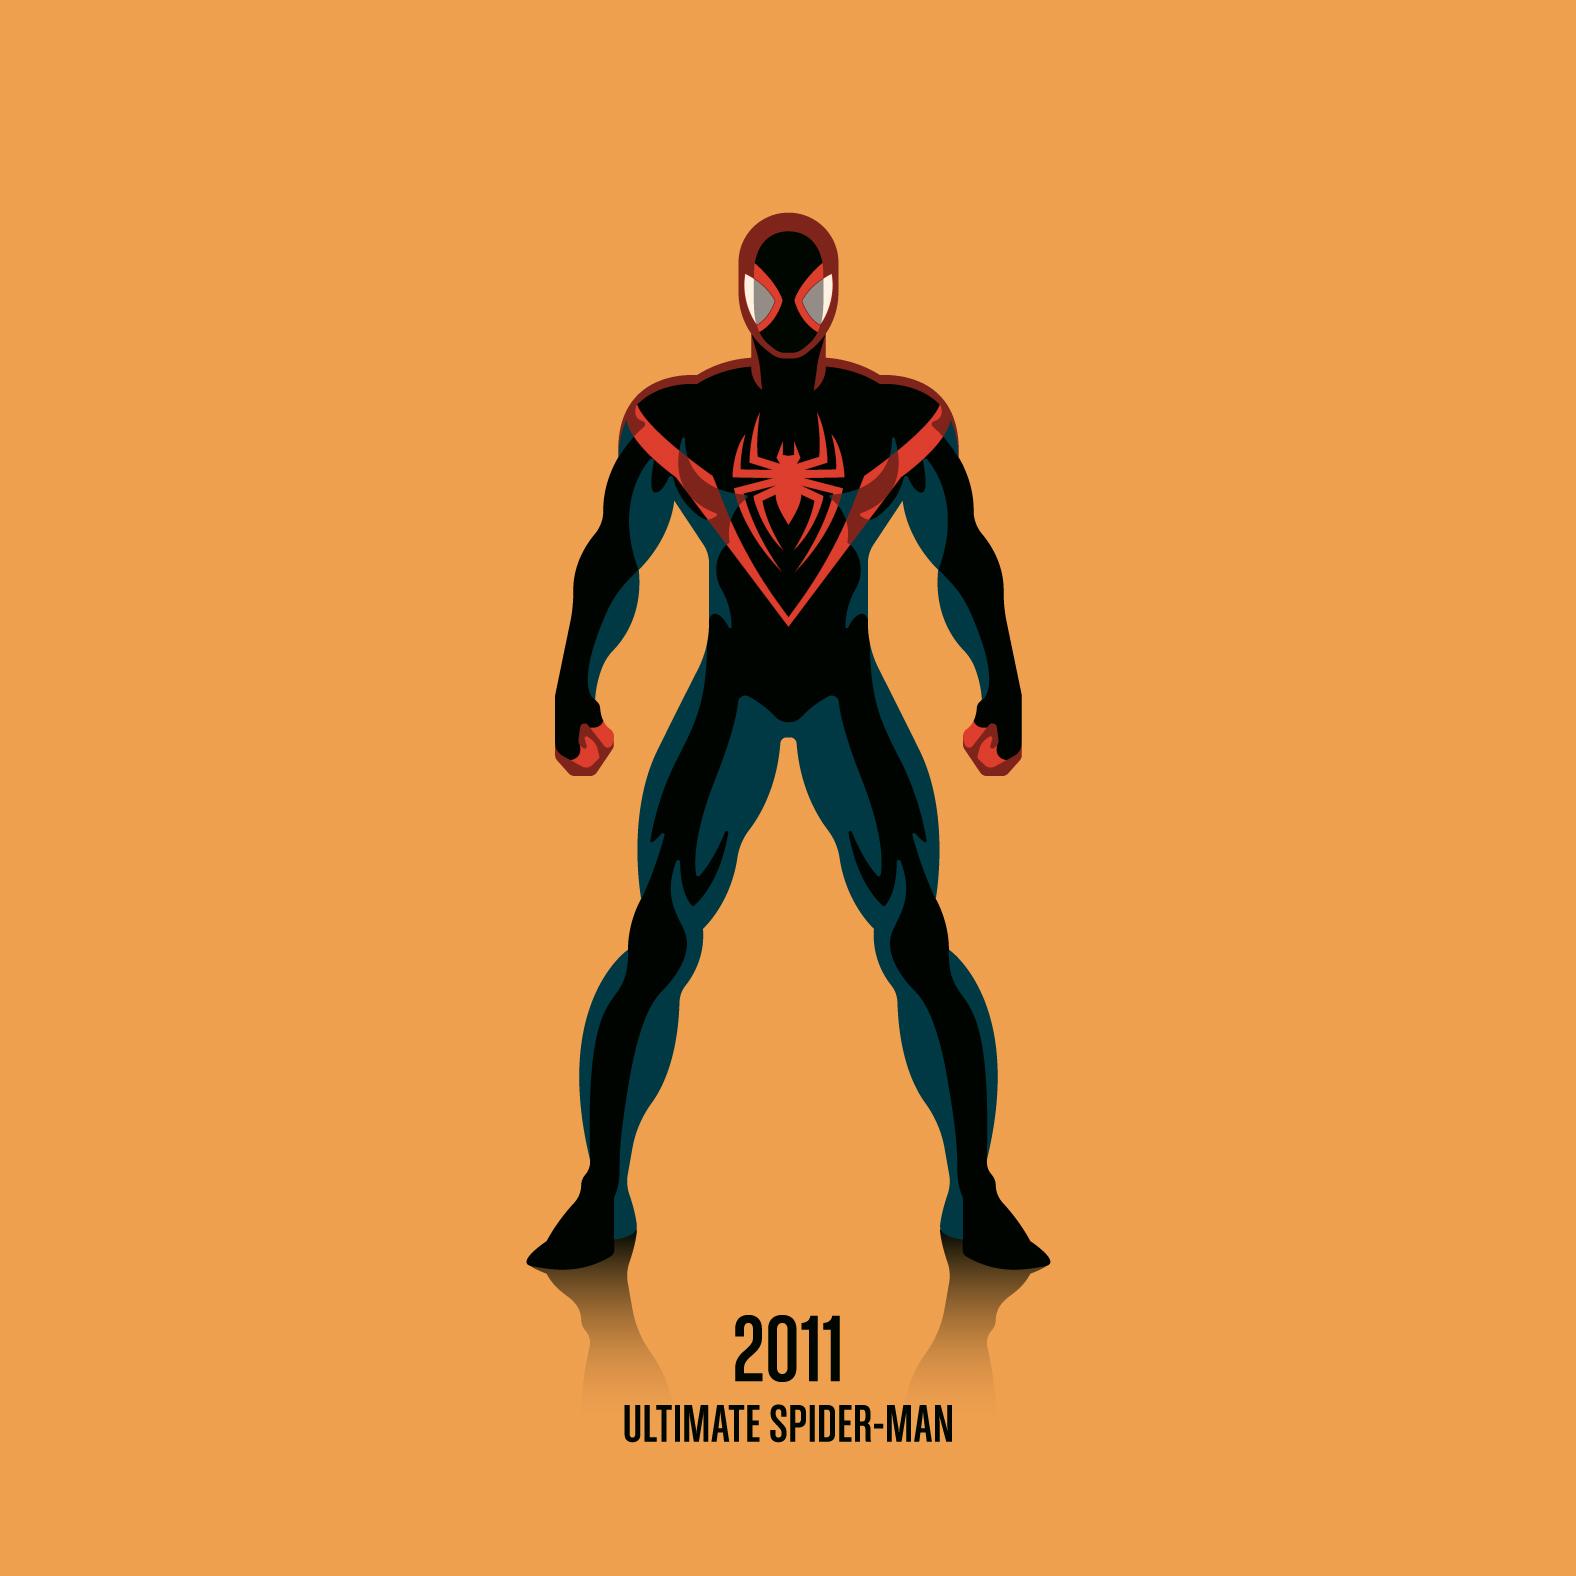 2_spiderman-14.jpg